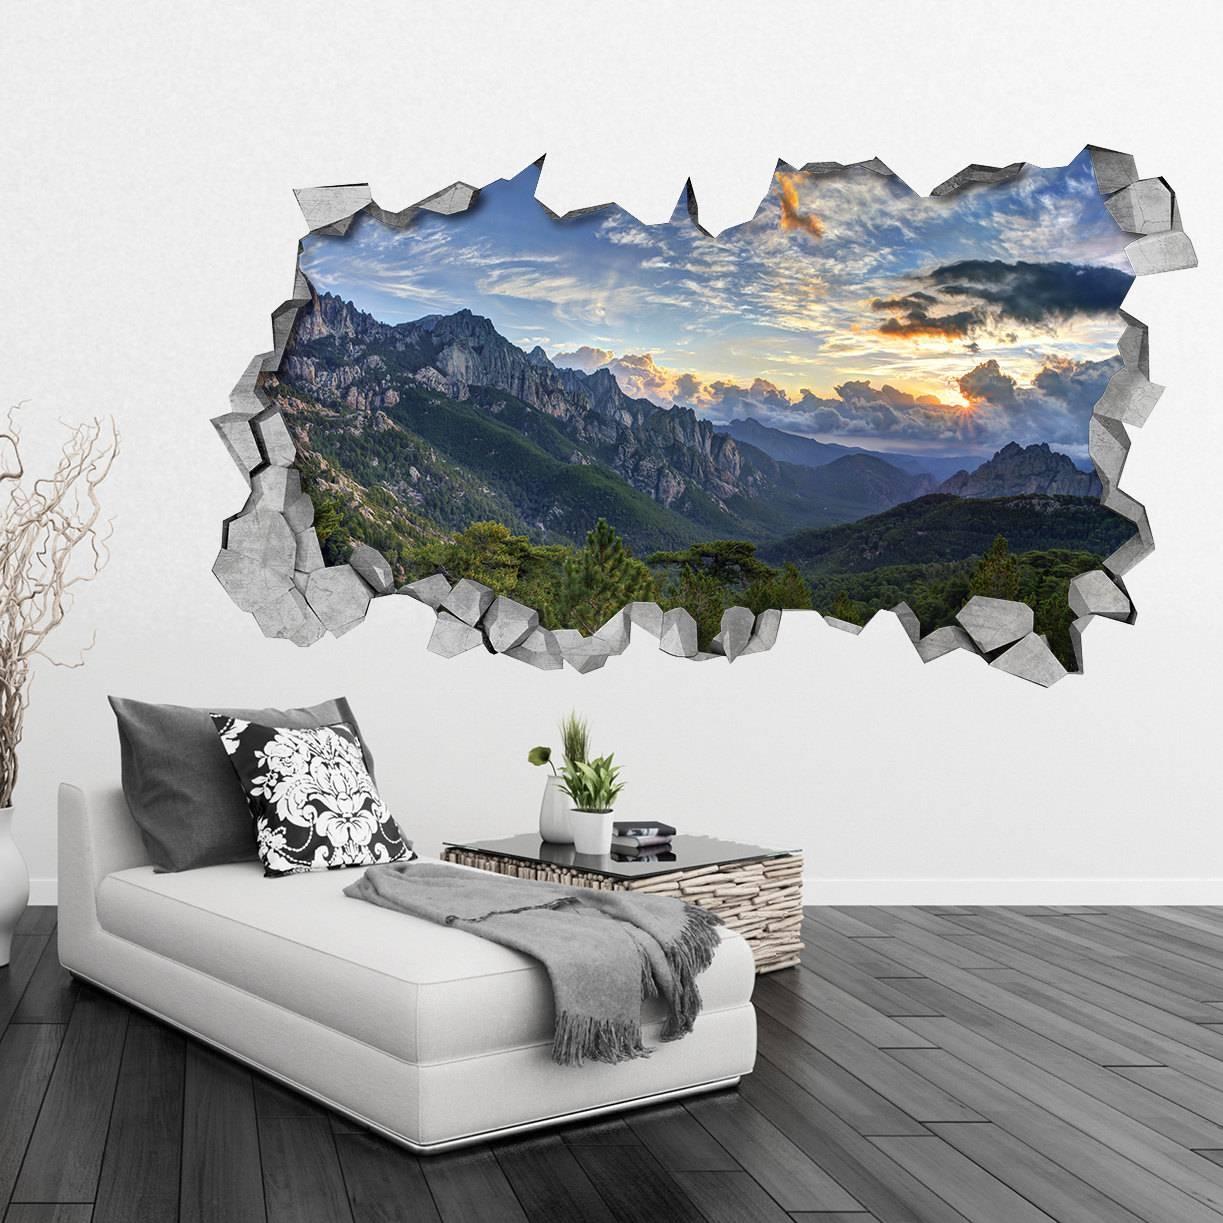 Mountains 3D Wallpaper Broken Wall Decal Wall Sticker Intended For Best And Newest Venezuela Wall Art 3D (View 15 of 20)